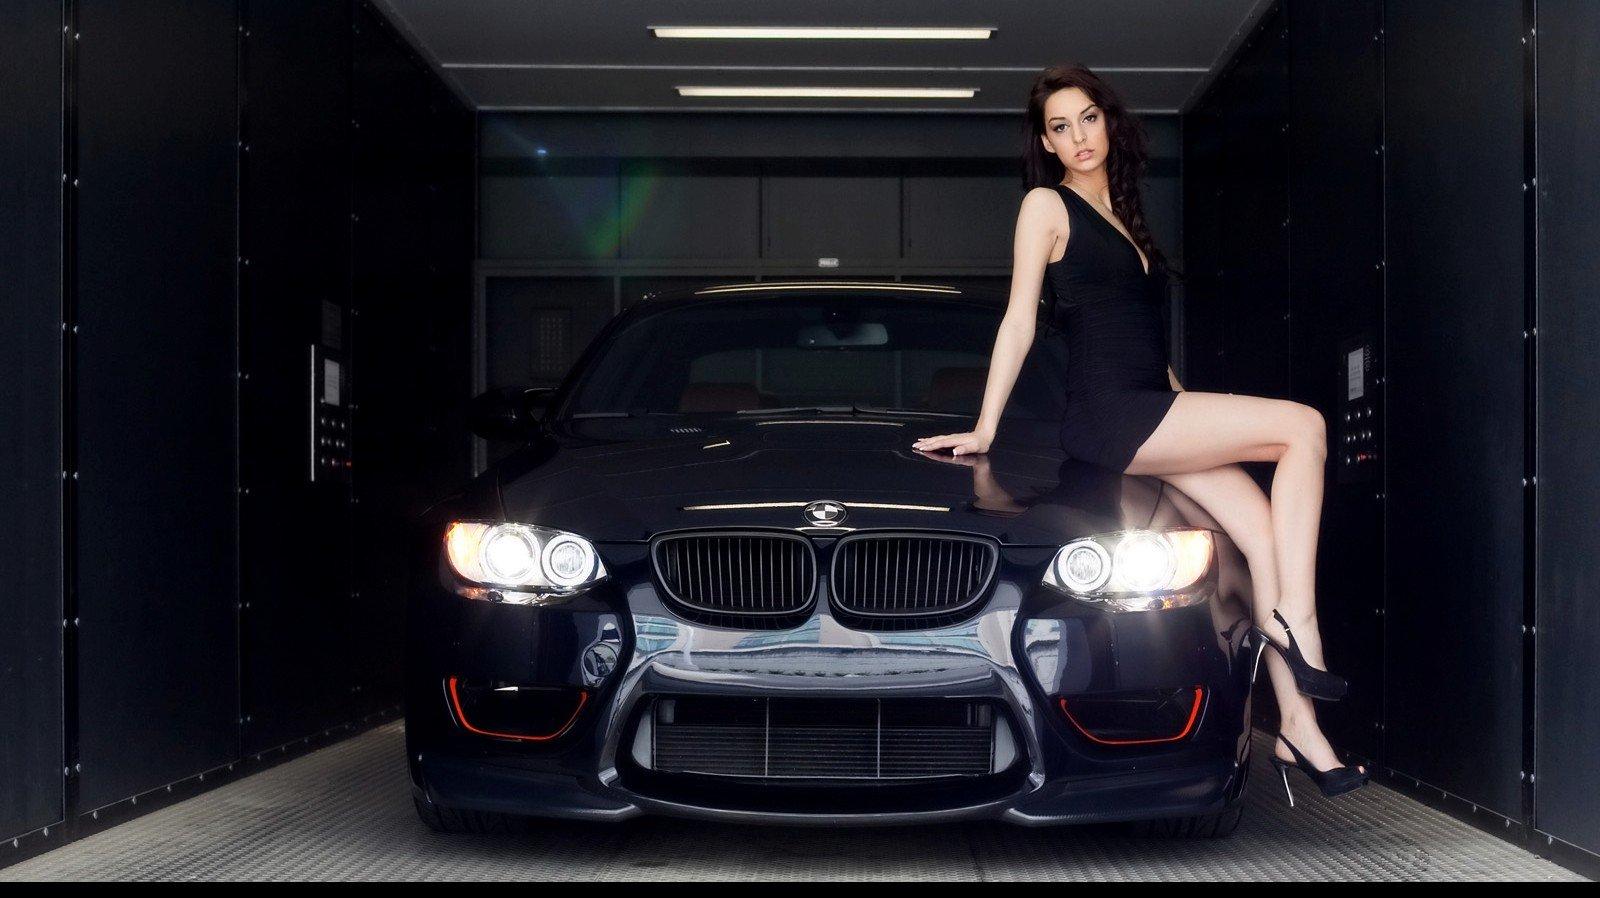 BMW, Car, BMW M3, Women HD Wallpapers / Desktop and Mobile ...